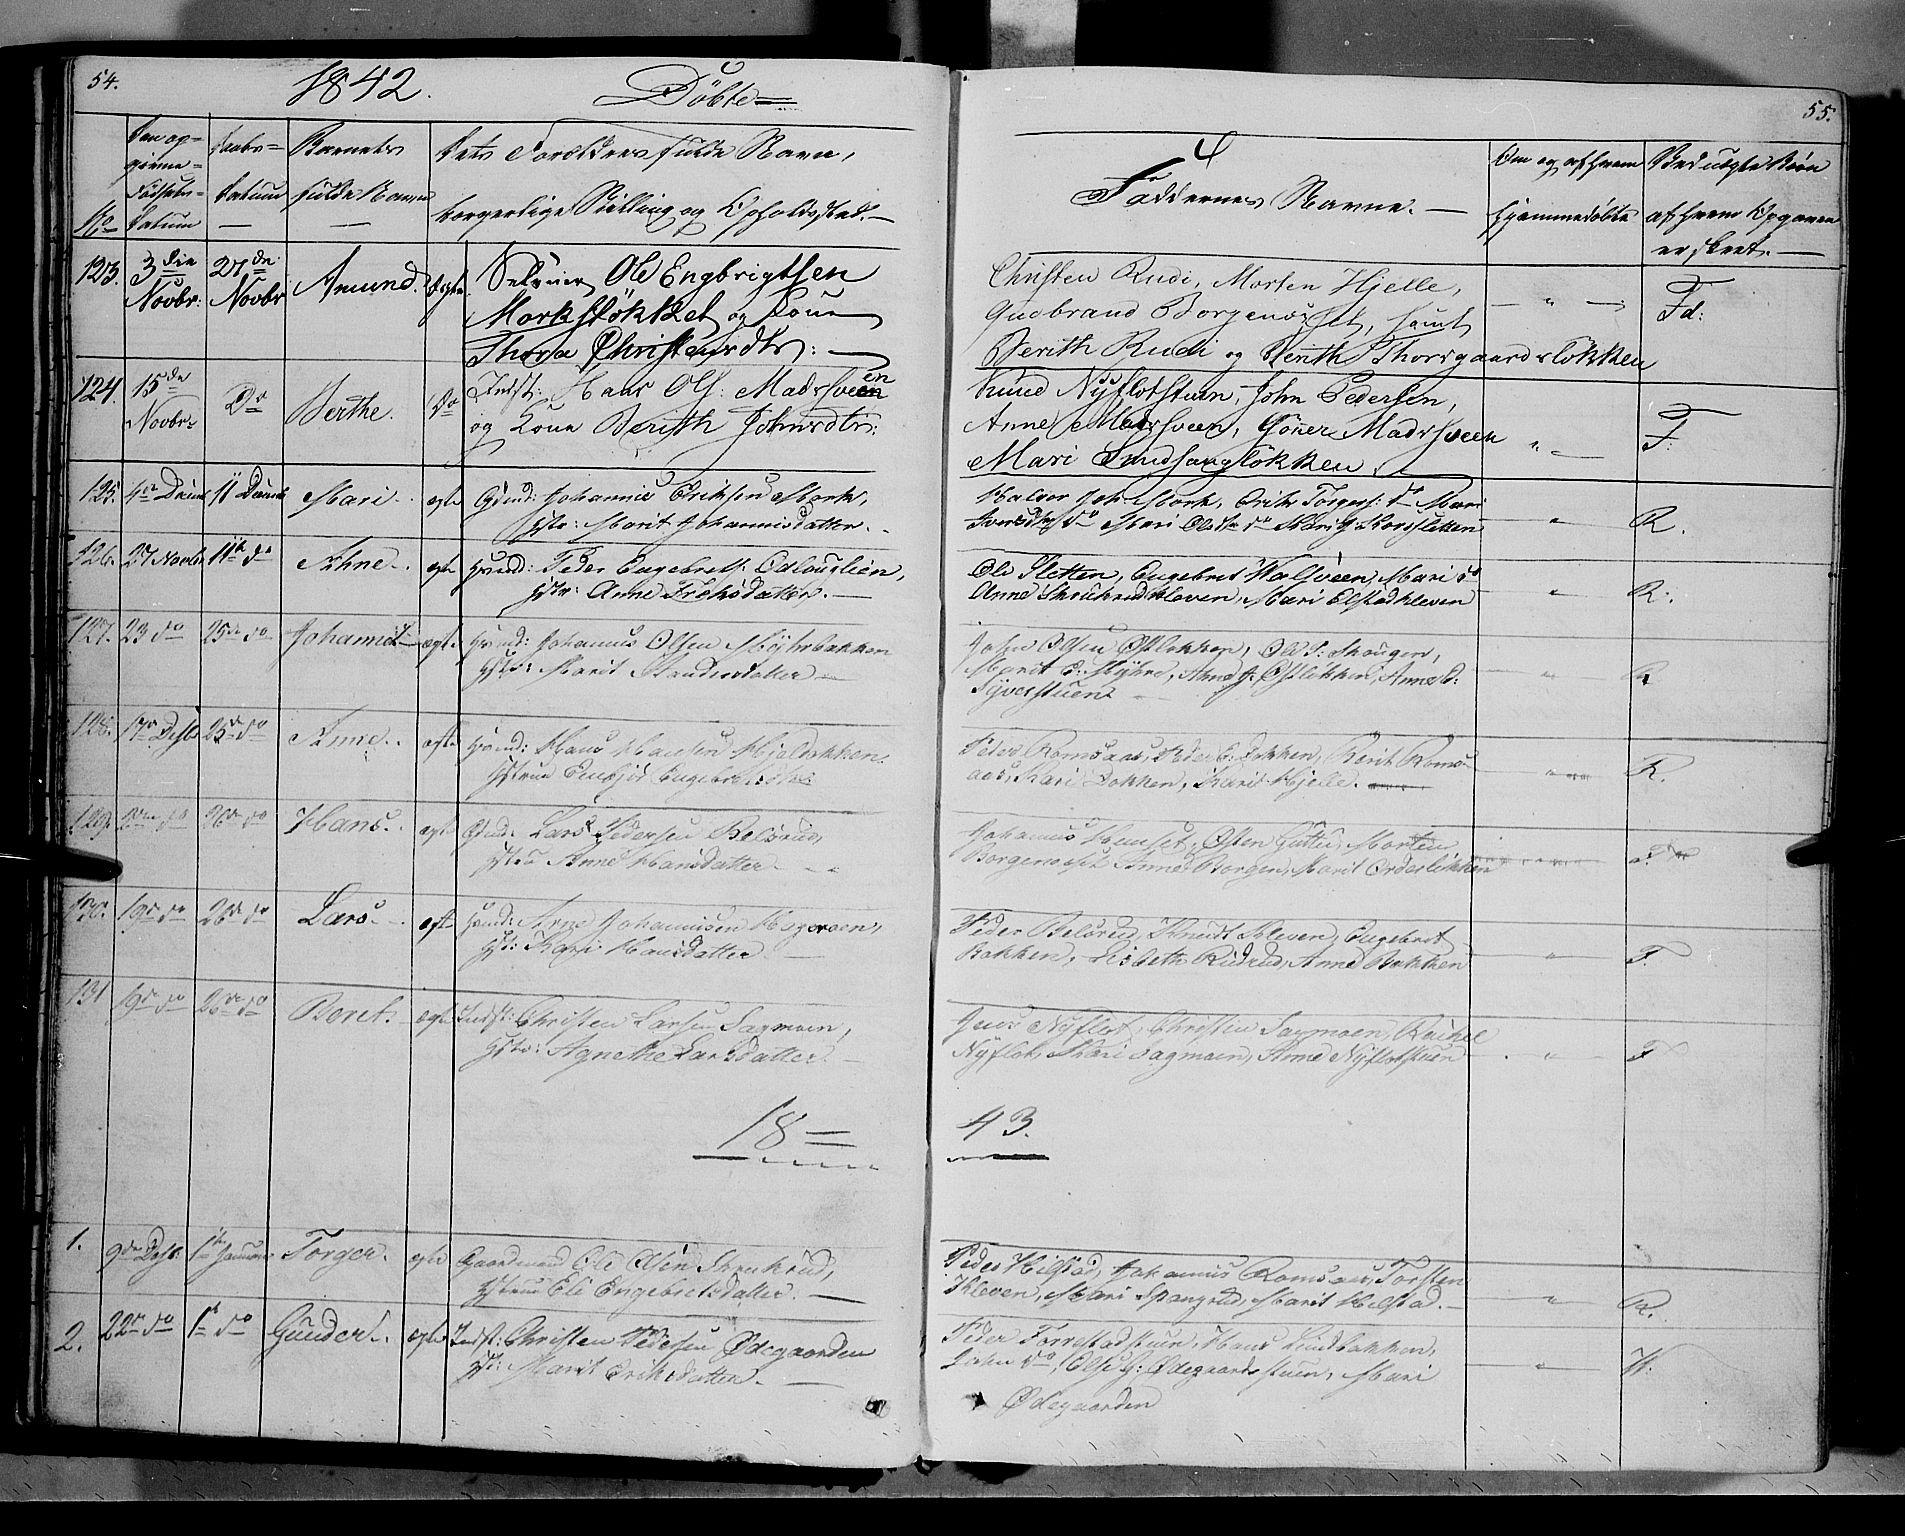 SAH, Ringebu prestekontor, Ministerialbok nr. 5, 1839-1848, s. 54-55